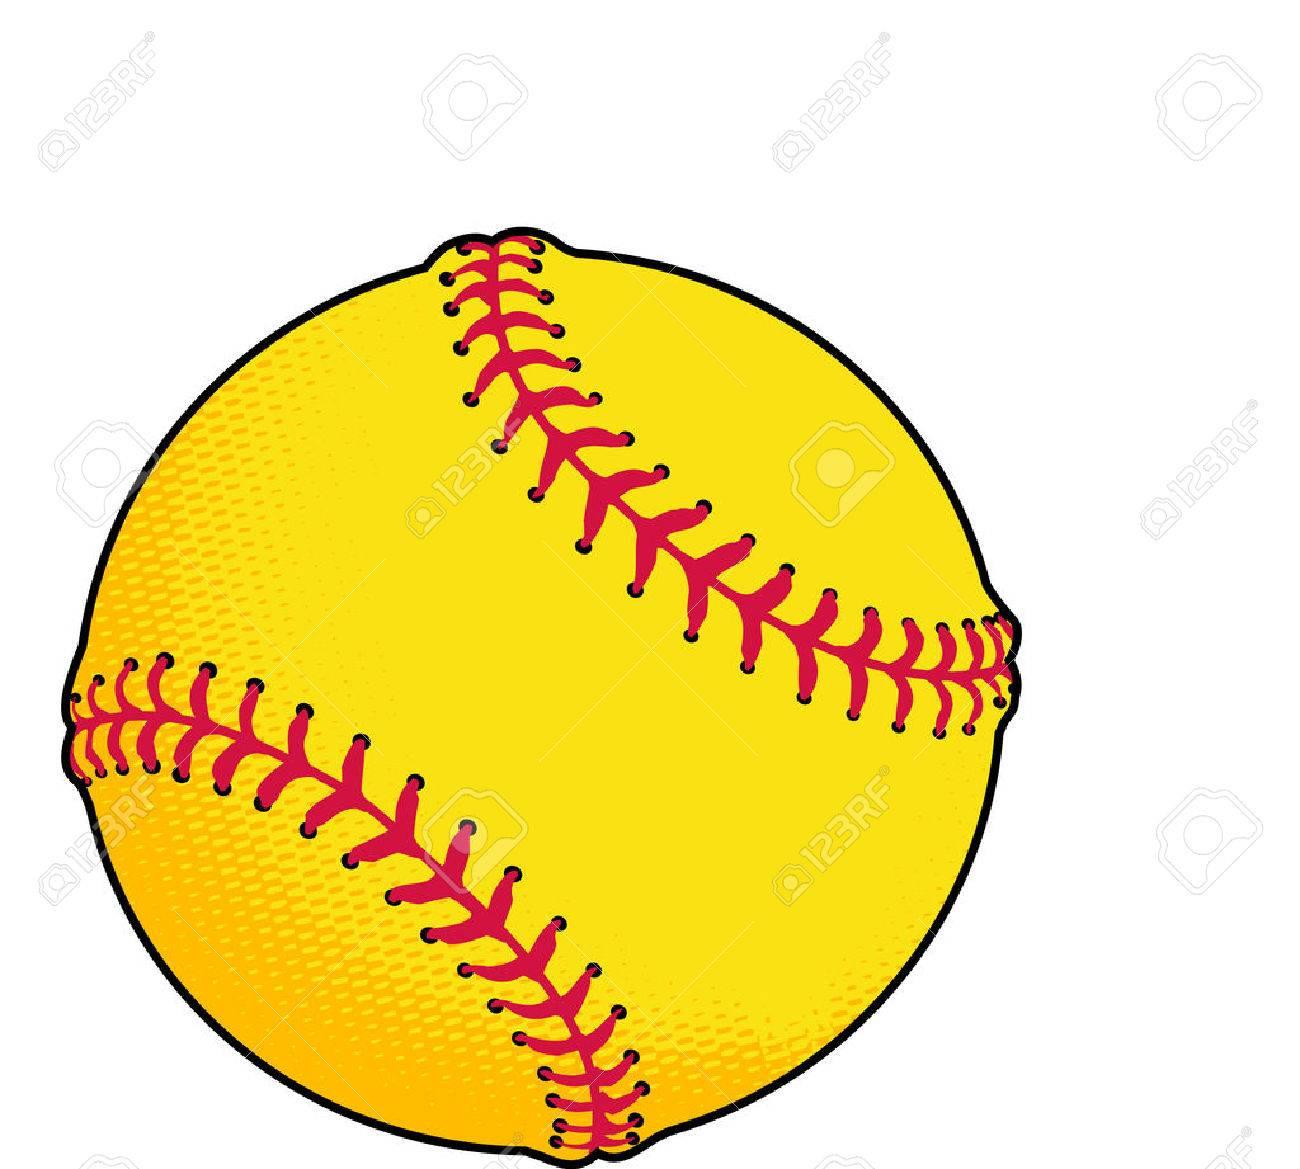 Yellow Softball Image Softball Yellow Softball or